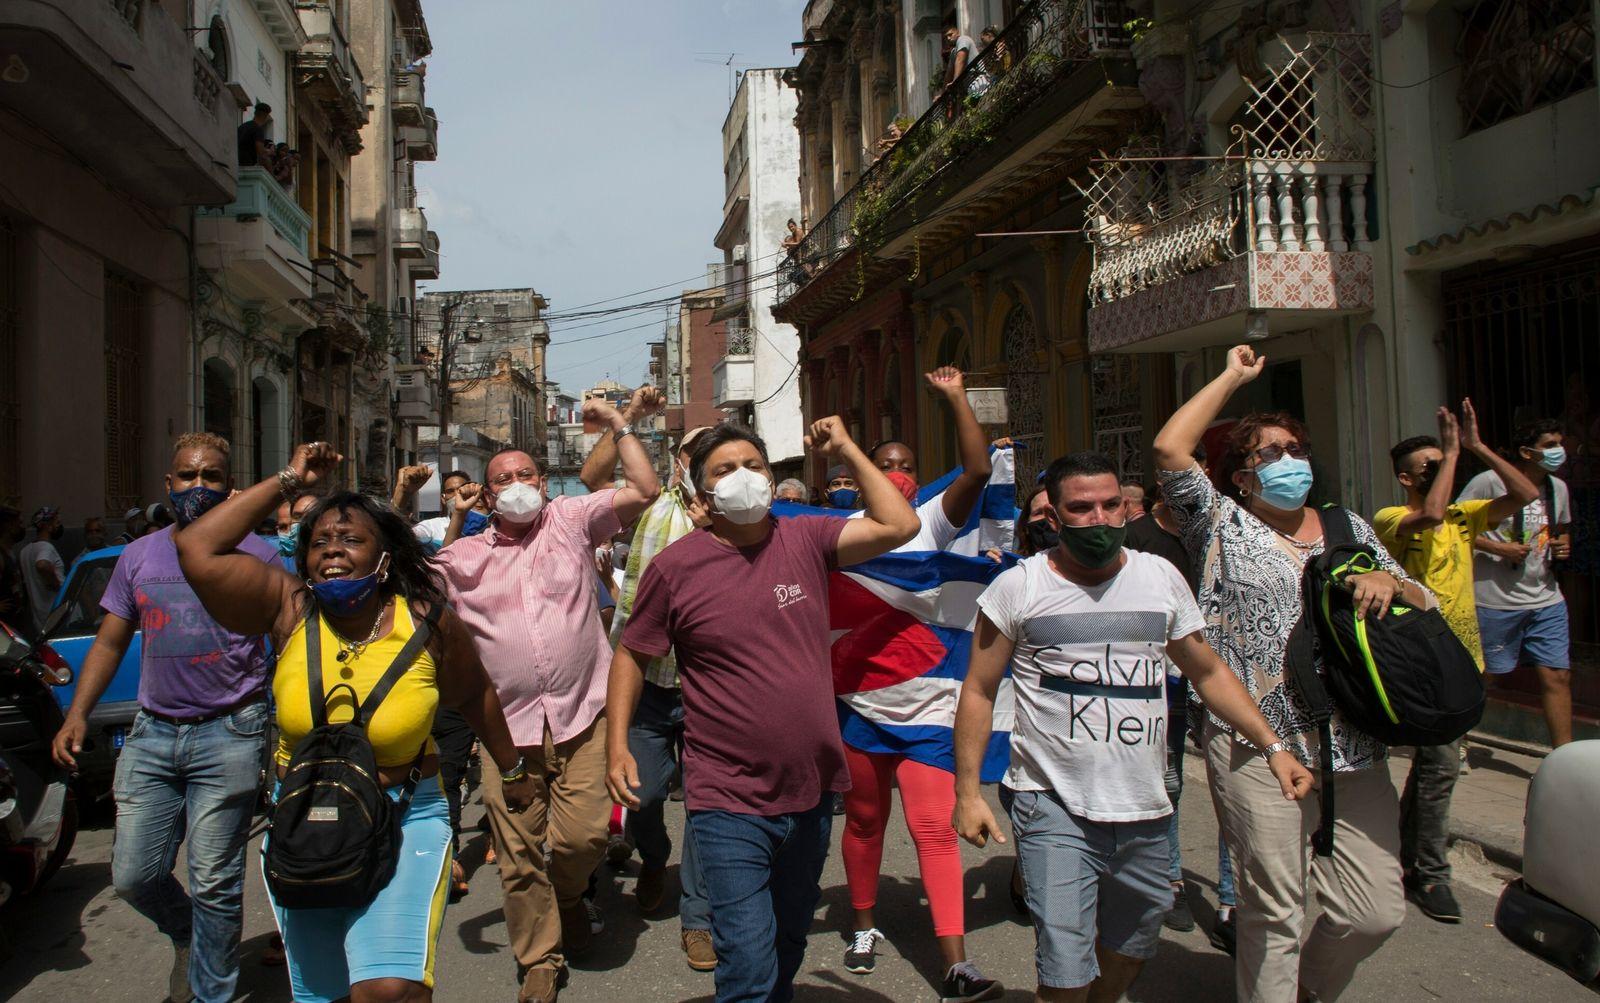 Cuba protest march